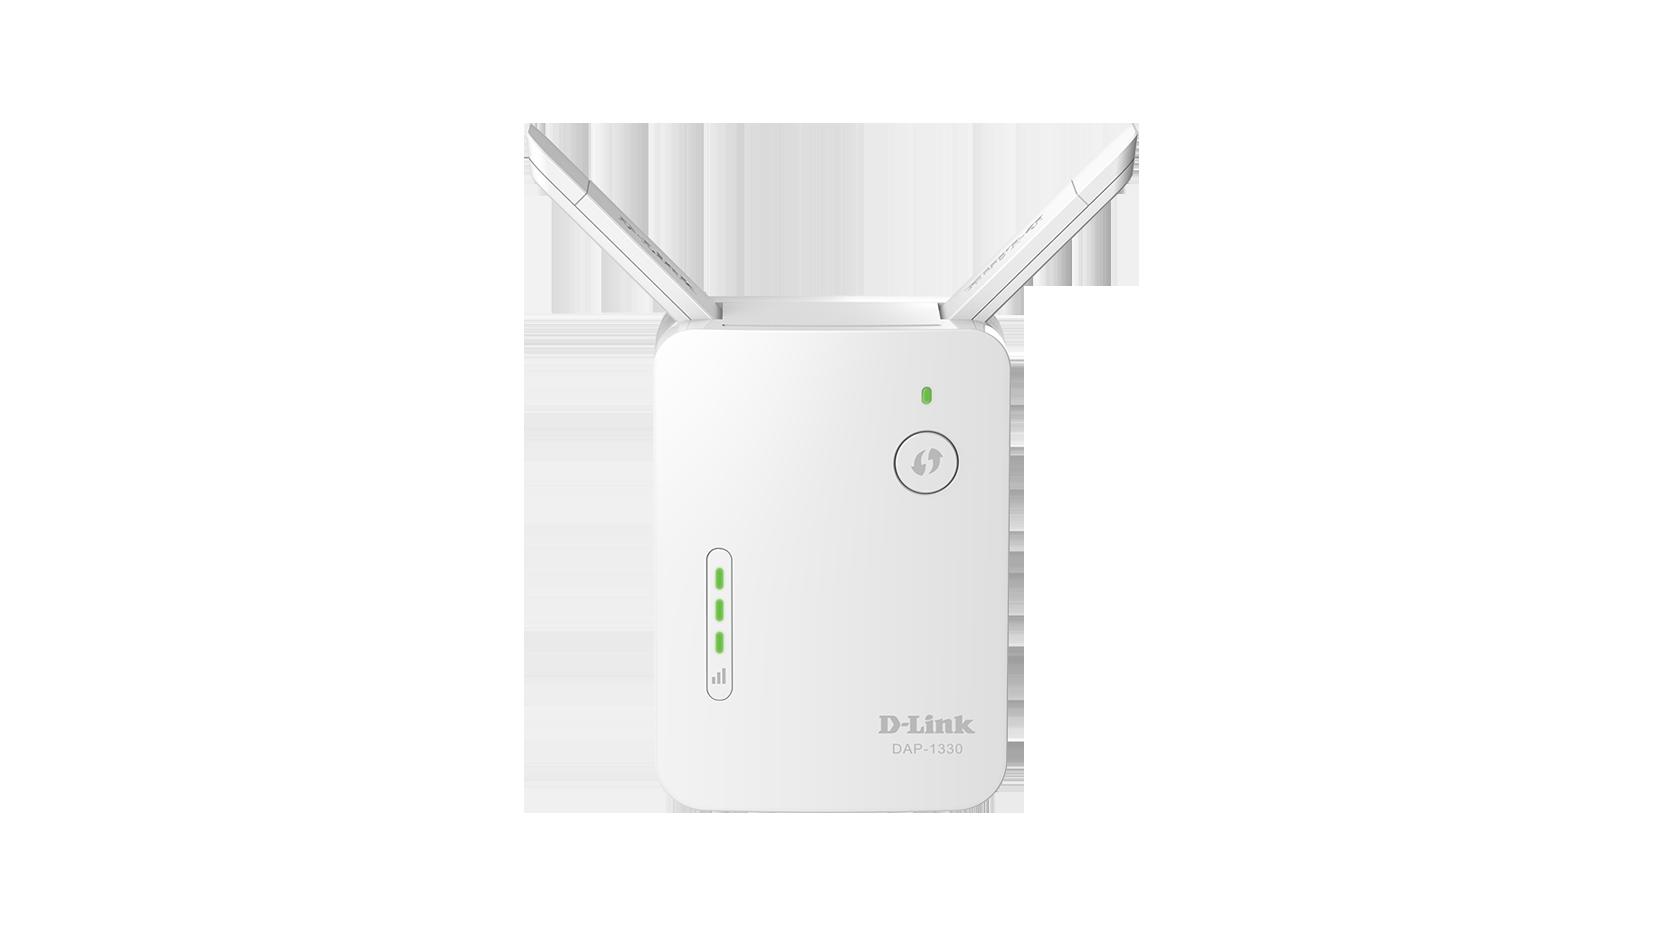 D-LINK Wireless N300 Range Extender with 1 Ethernet Port DAP-1330